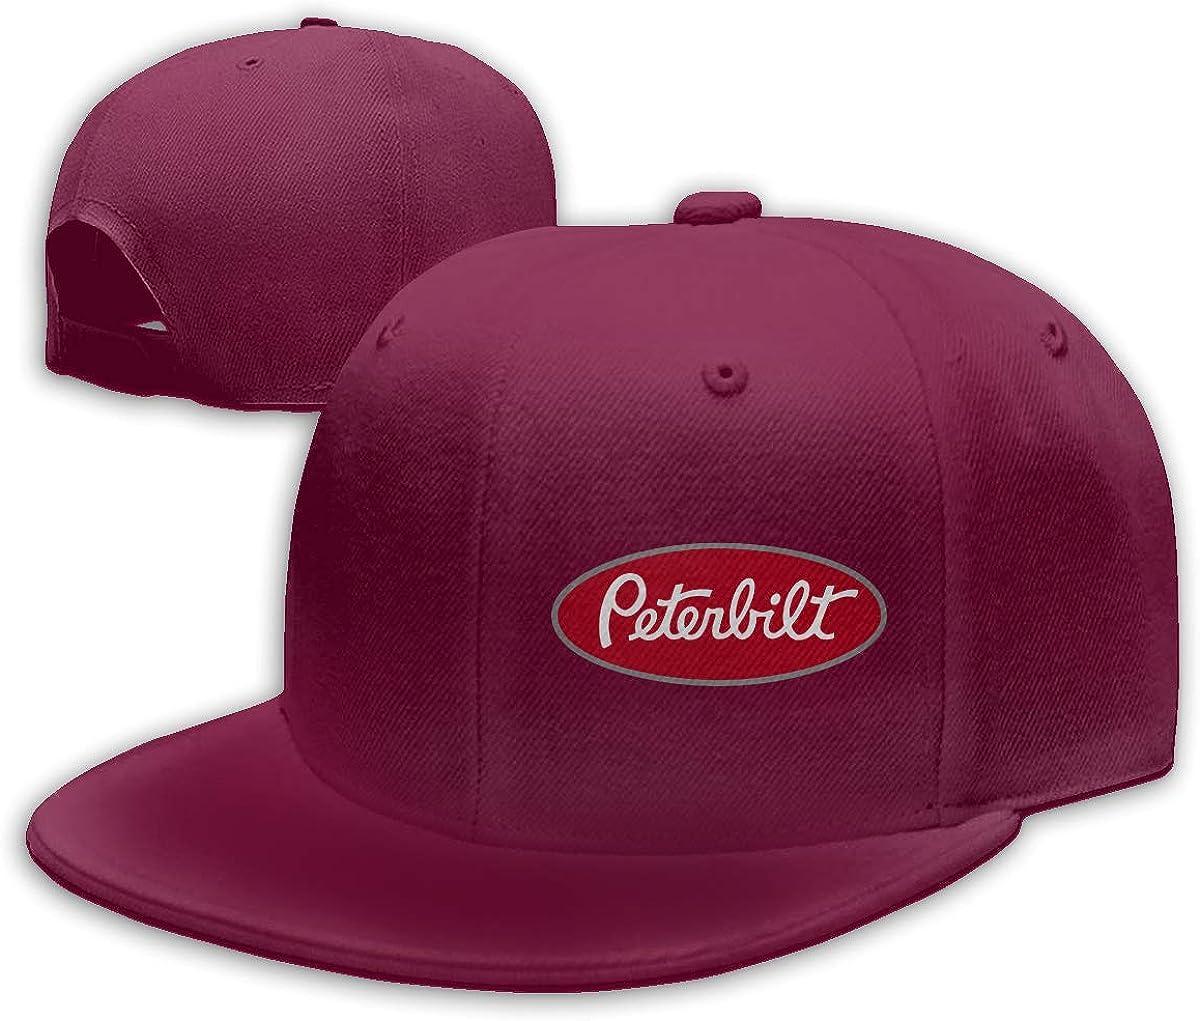 ZaHome Women's Peterbilt_red Cotton Baseball Snapback Hats Adjustable Structured Fit Cap